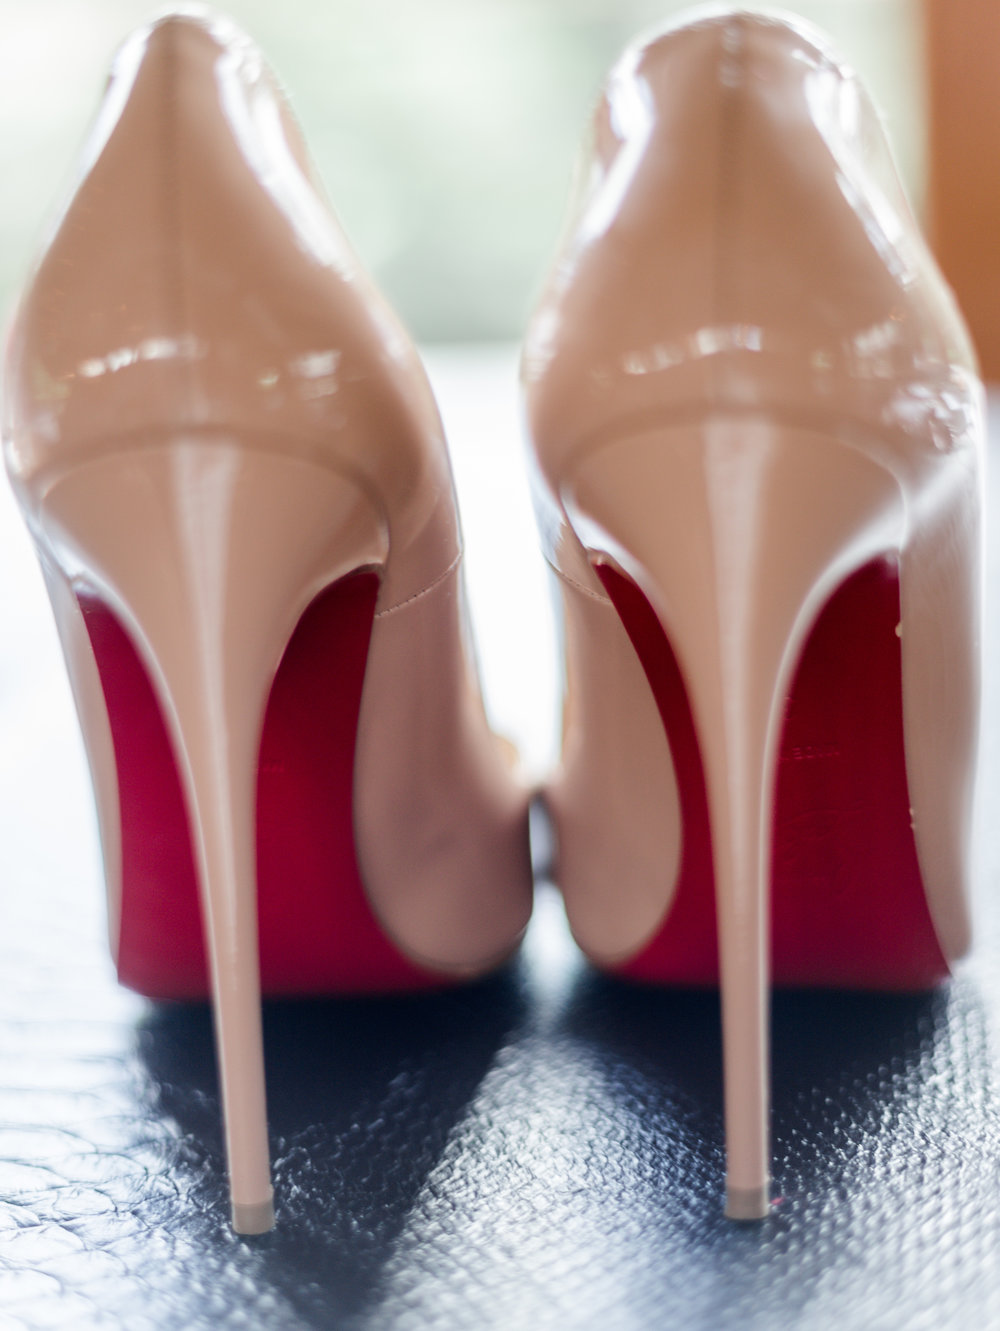 Ashton Creek Vineyard Wedding Shoot - Louboutin shoes